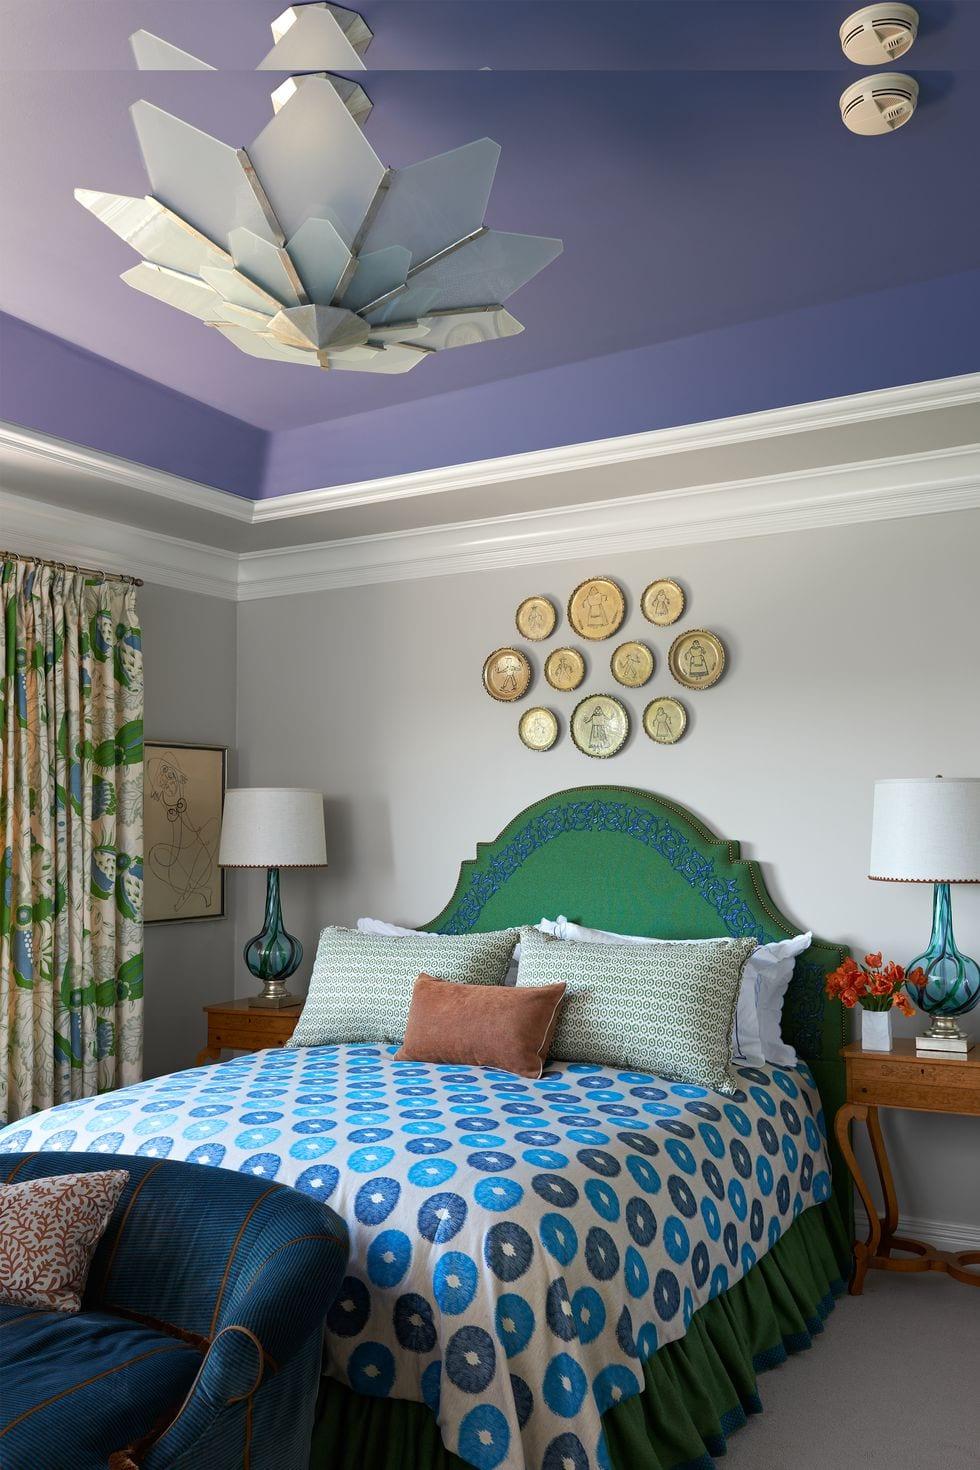 Preety bedroom design ideas for women